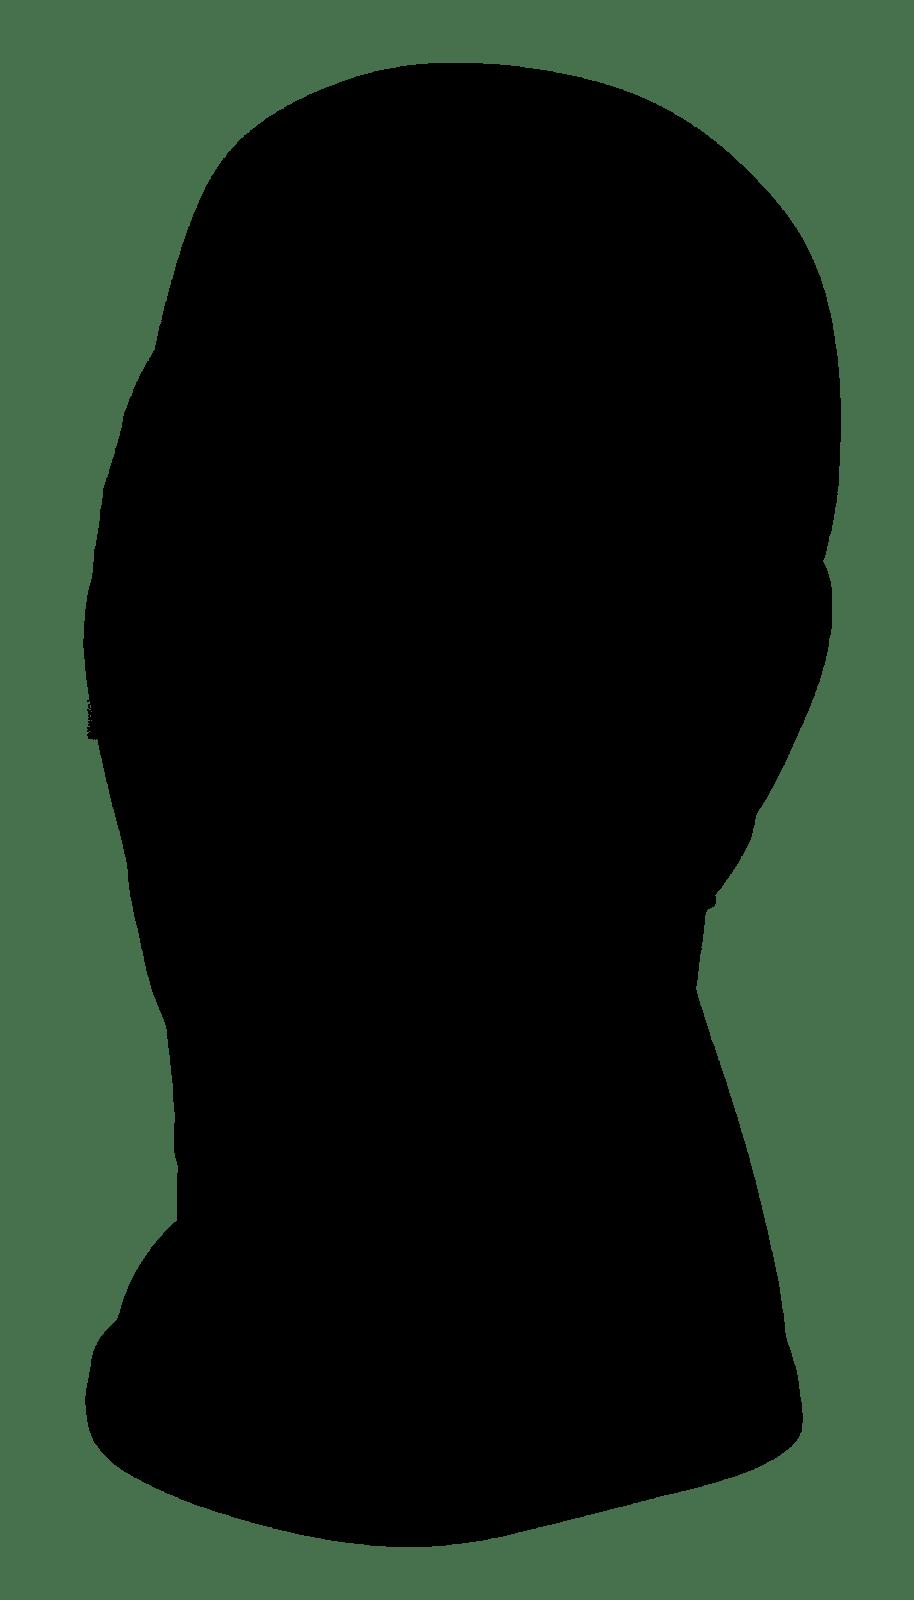 SOTTOCASCO FRESH-TECH MASK LAMPADA